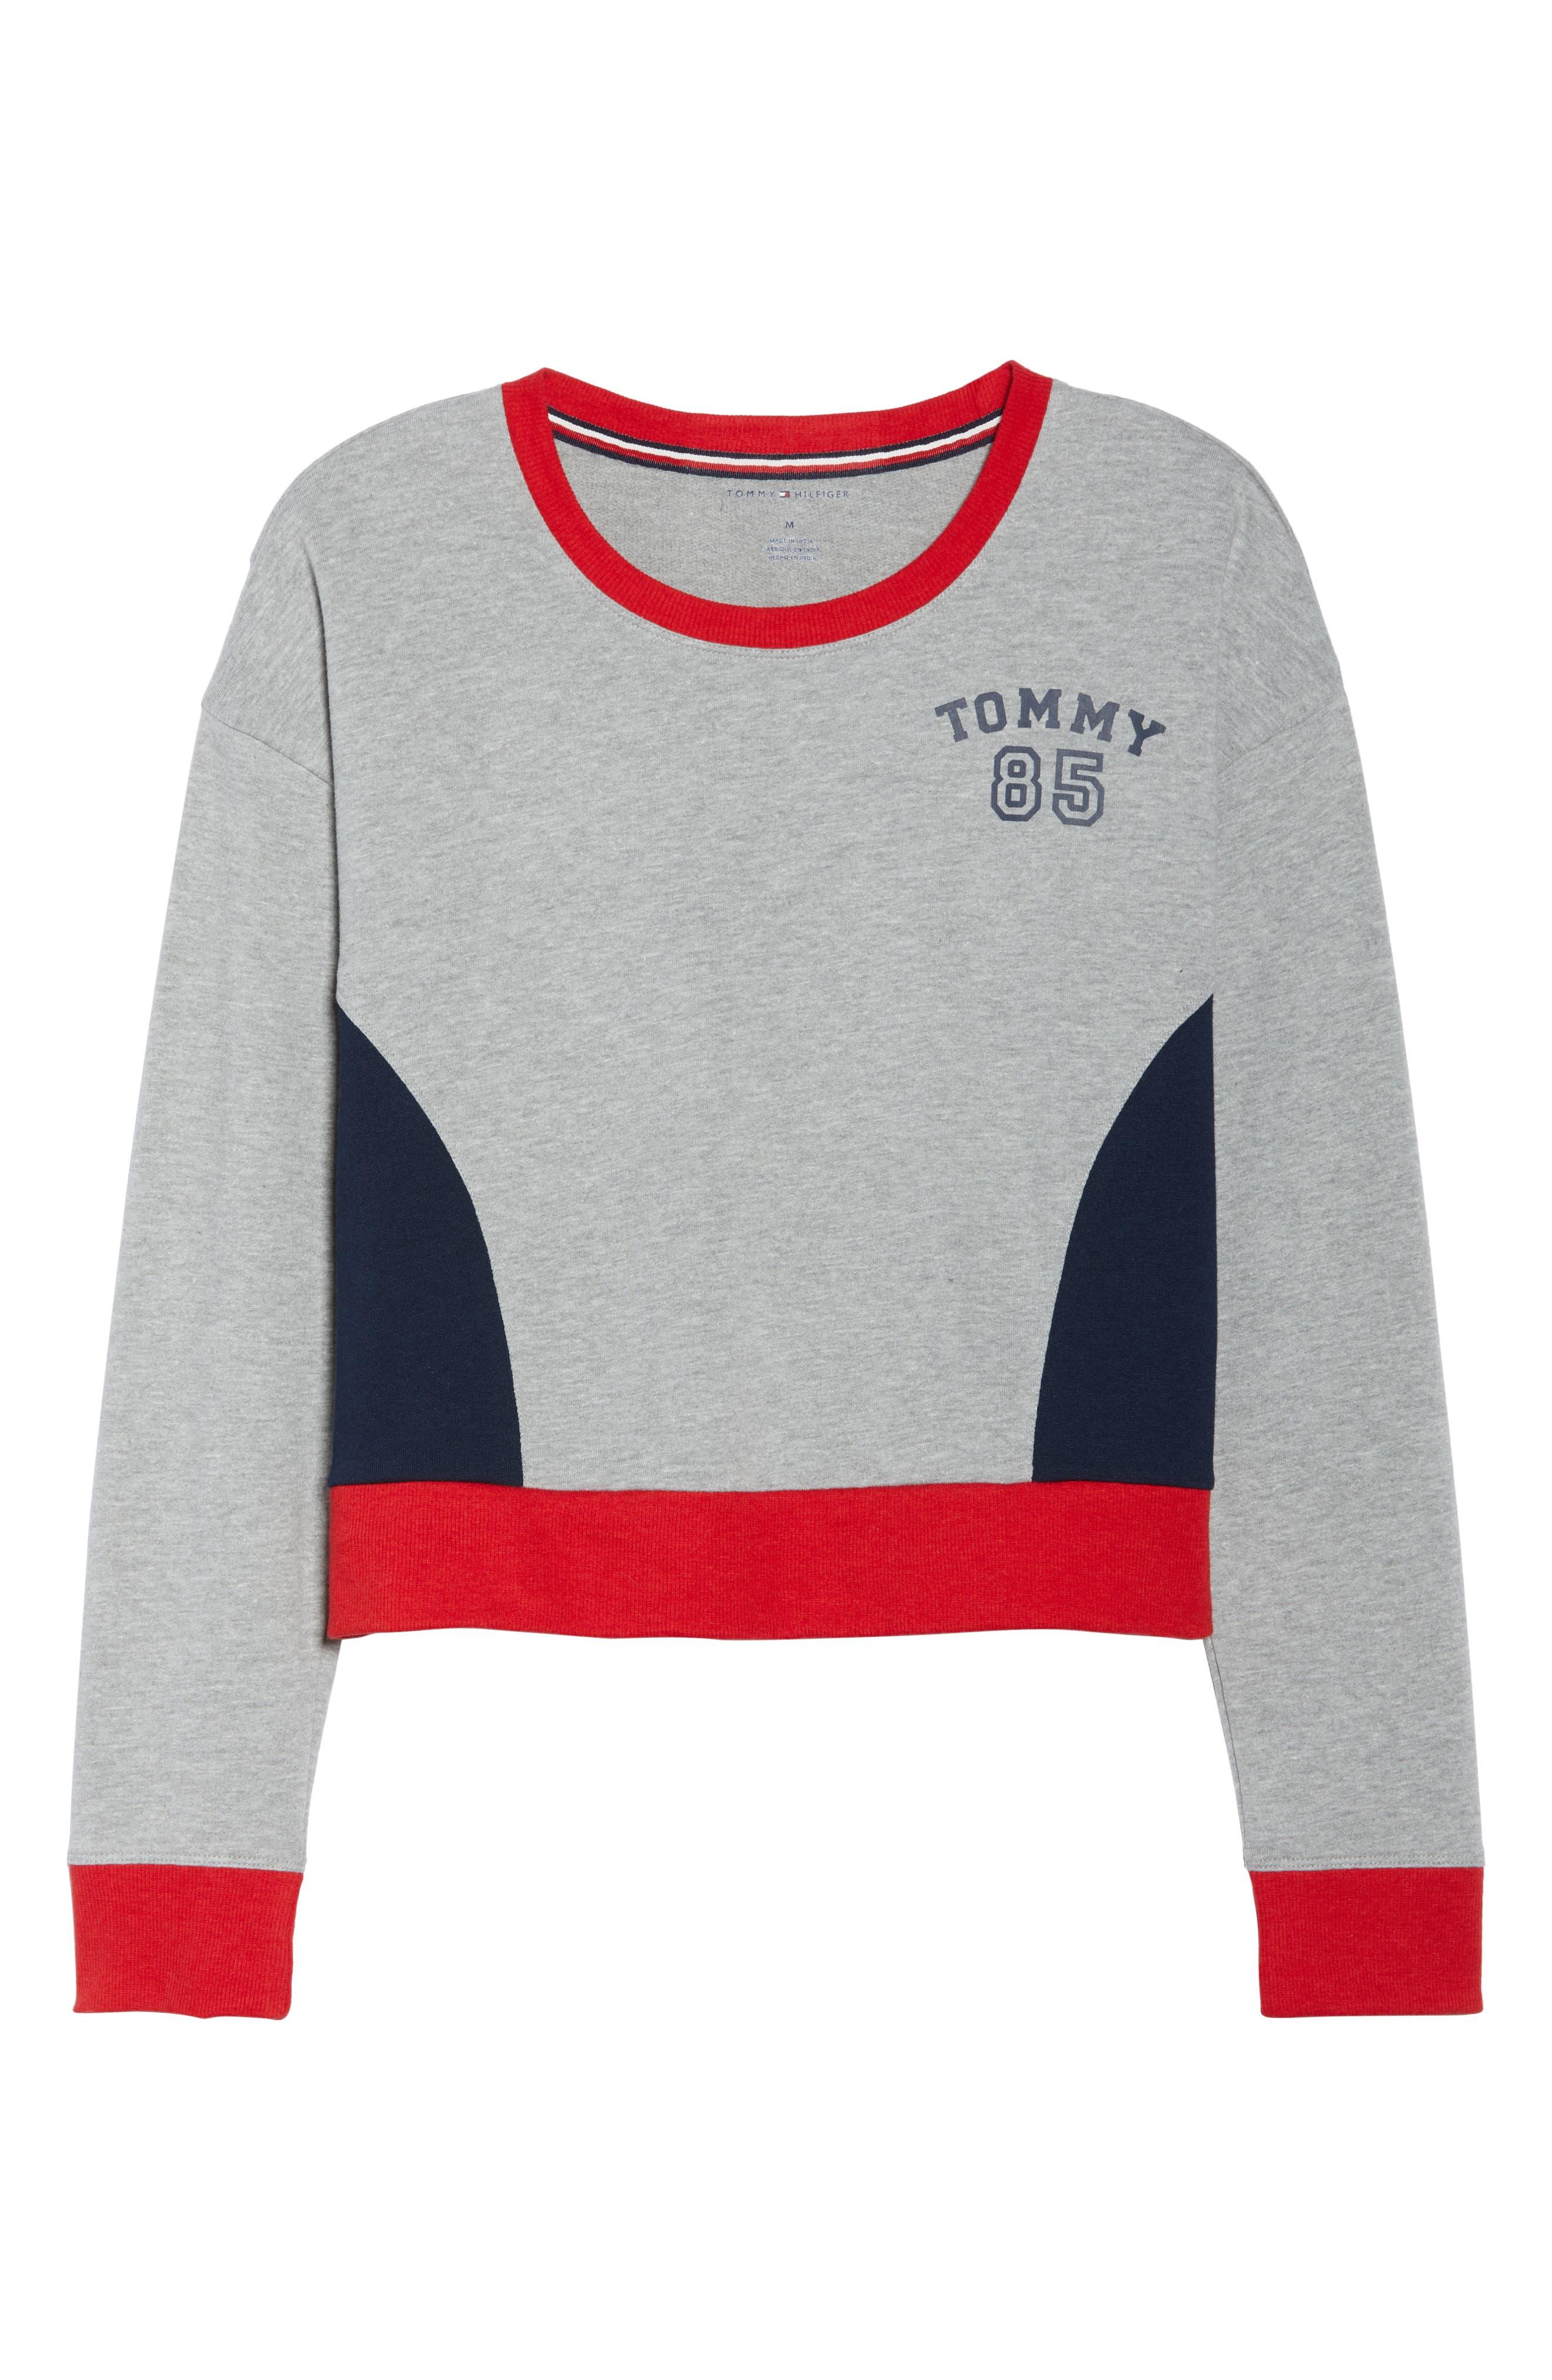 TOMMY HILFIGER,                             Crop Lounge Sweatshirt,                             Alternate thumbnail 6, color,                             025